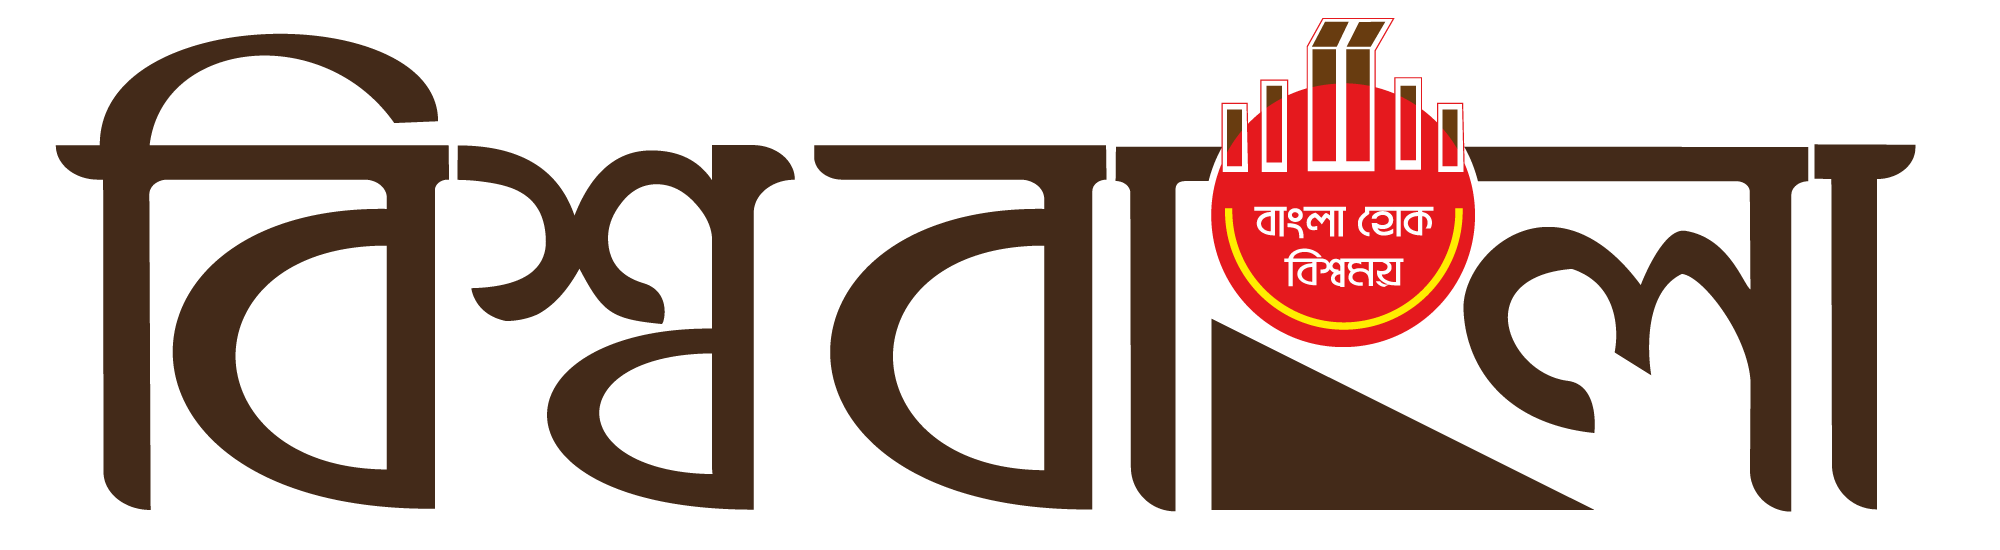 bishwa-bangla.com